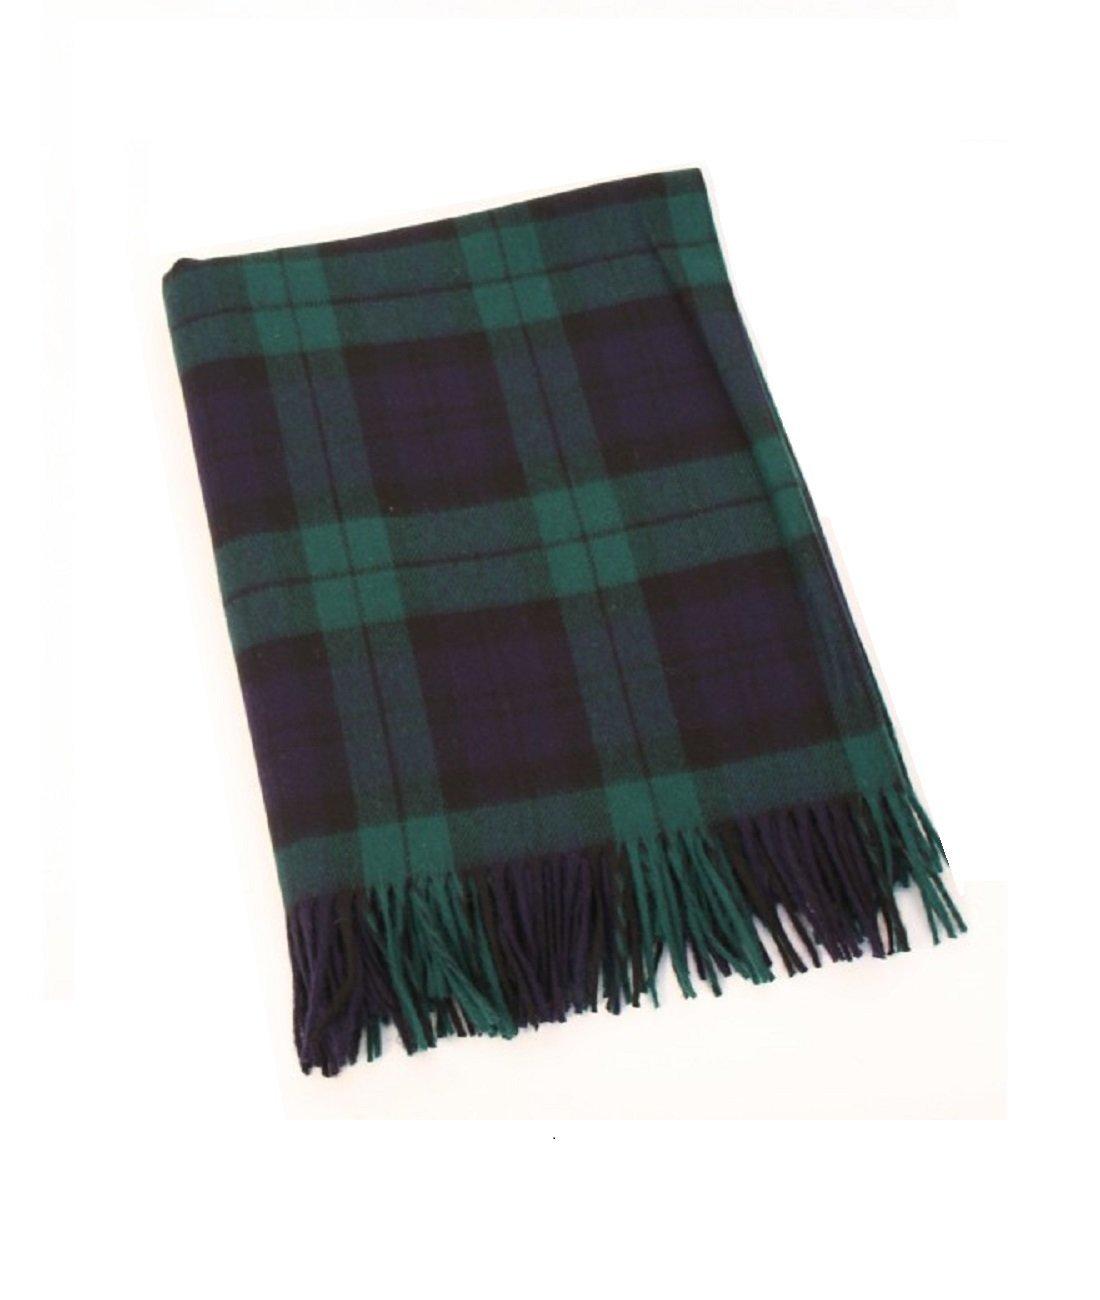 "55304db3b8a Get Quotations · John Hanly Irish Throw Blanket 100% Wool 54"" x 71""  Blackwatch Made in"